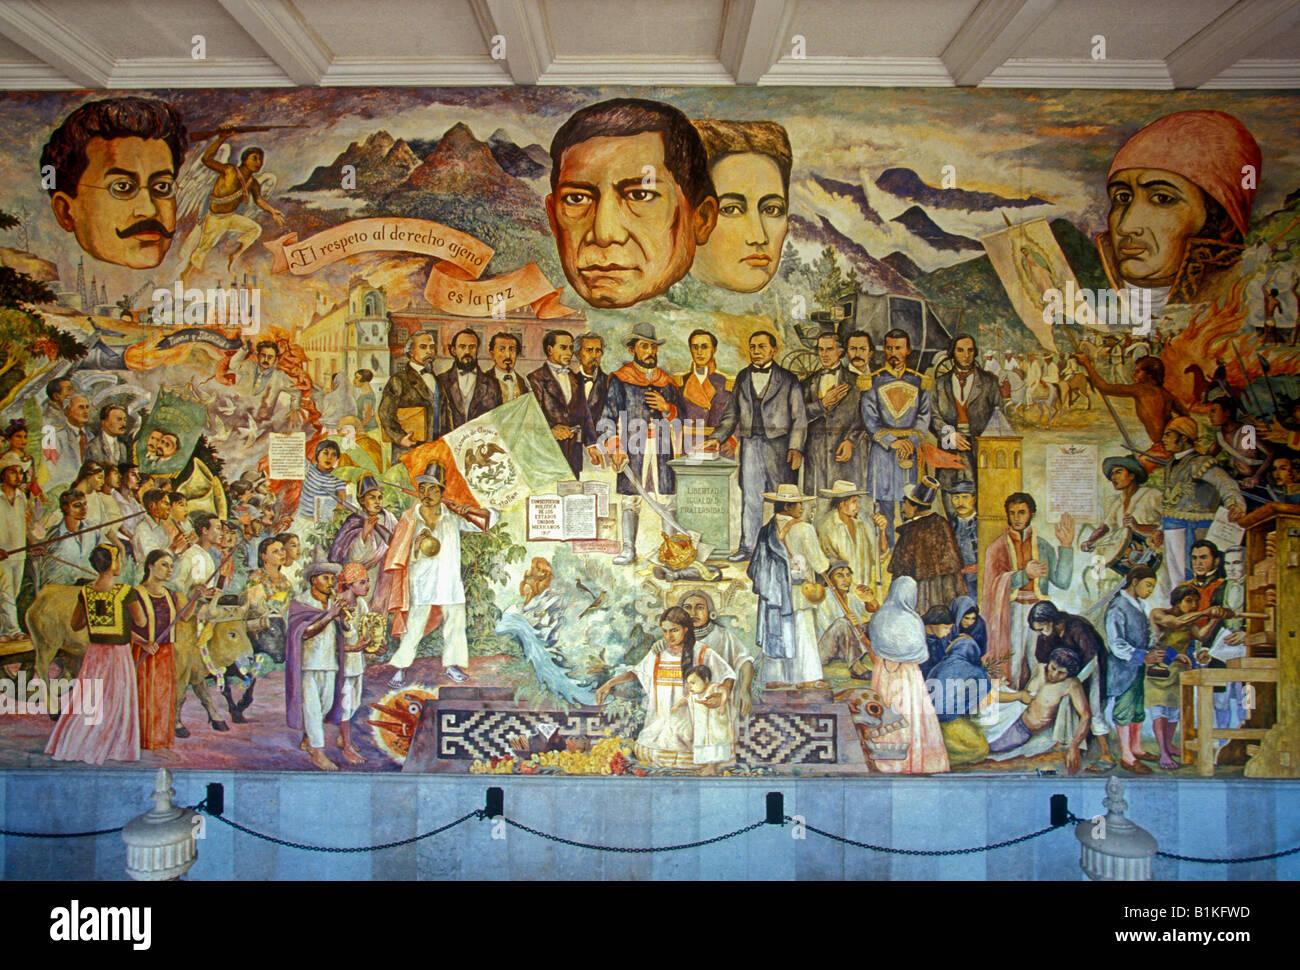 Mural epoca de reforma muralist arturo garcia bustos for Benito juarez mural